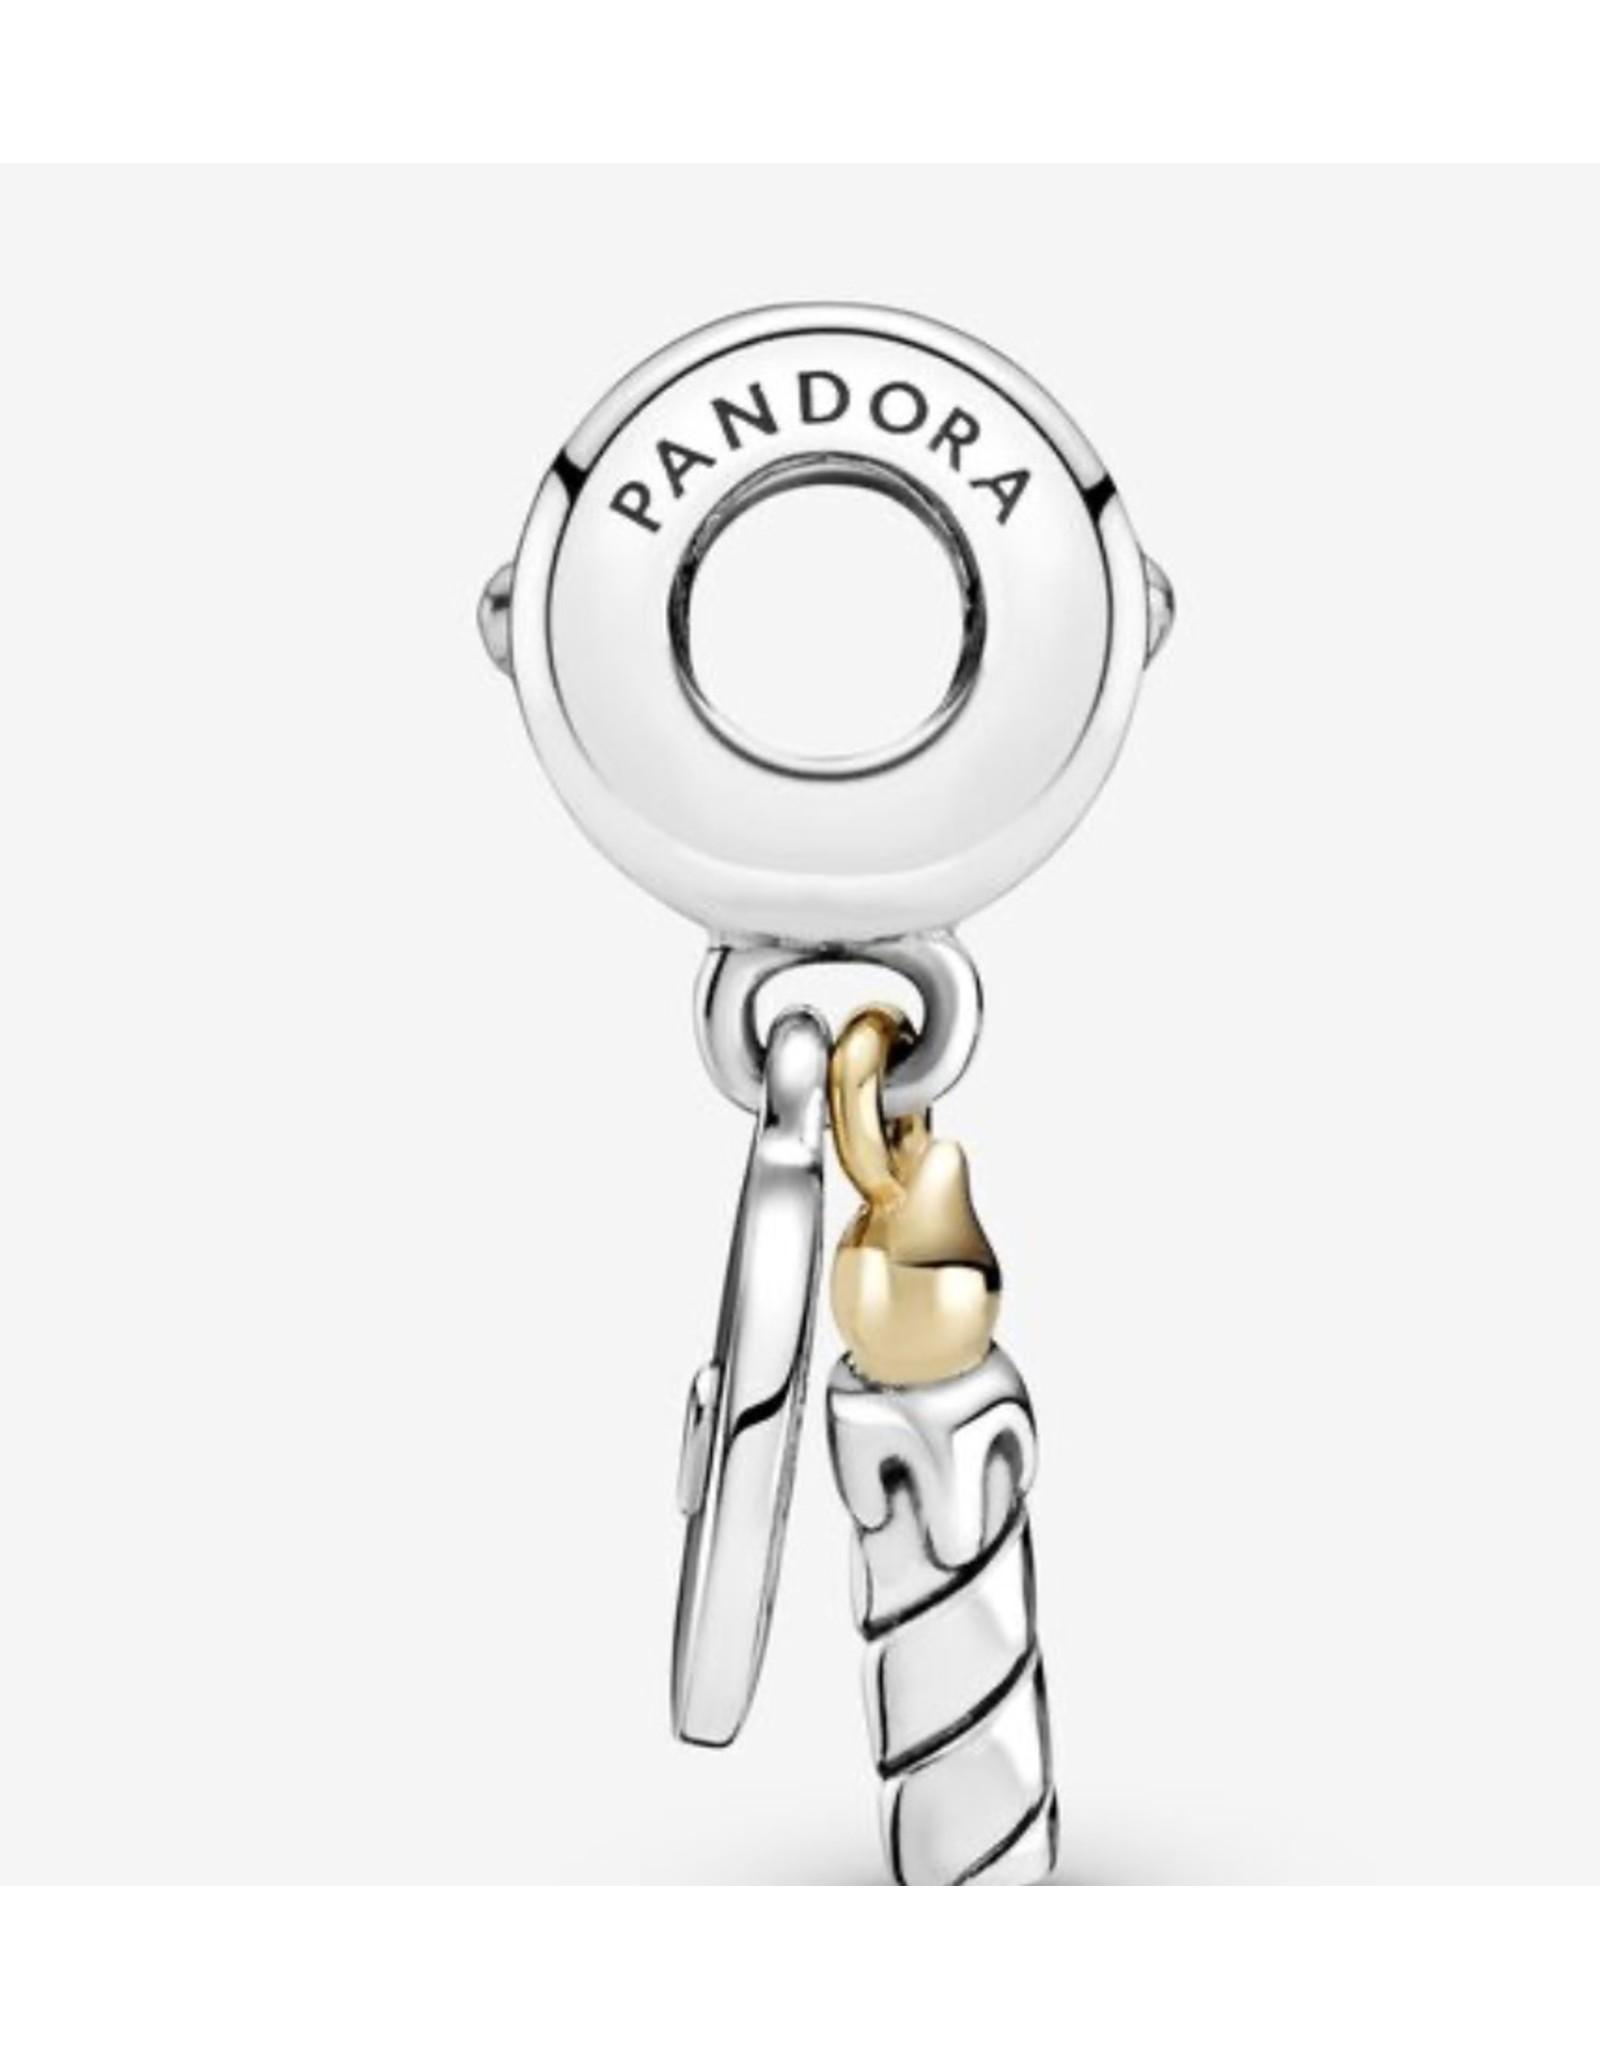 Pandora Pandora Charm,799328C00, Two-Tone Birthday Candle, 14K Gold